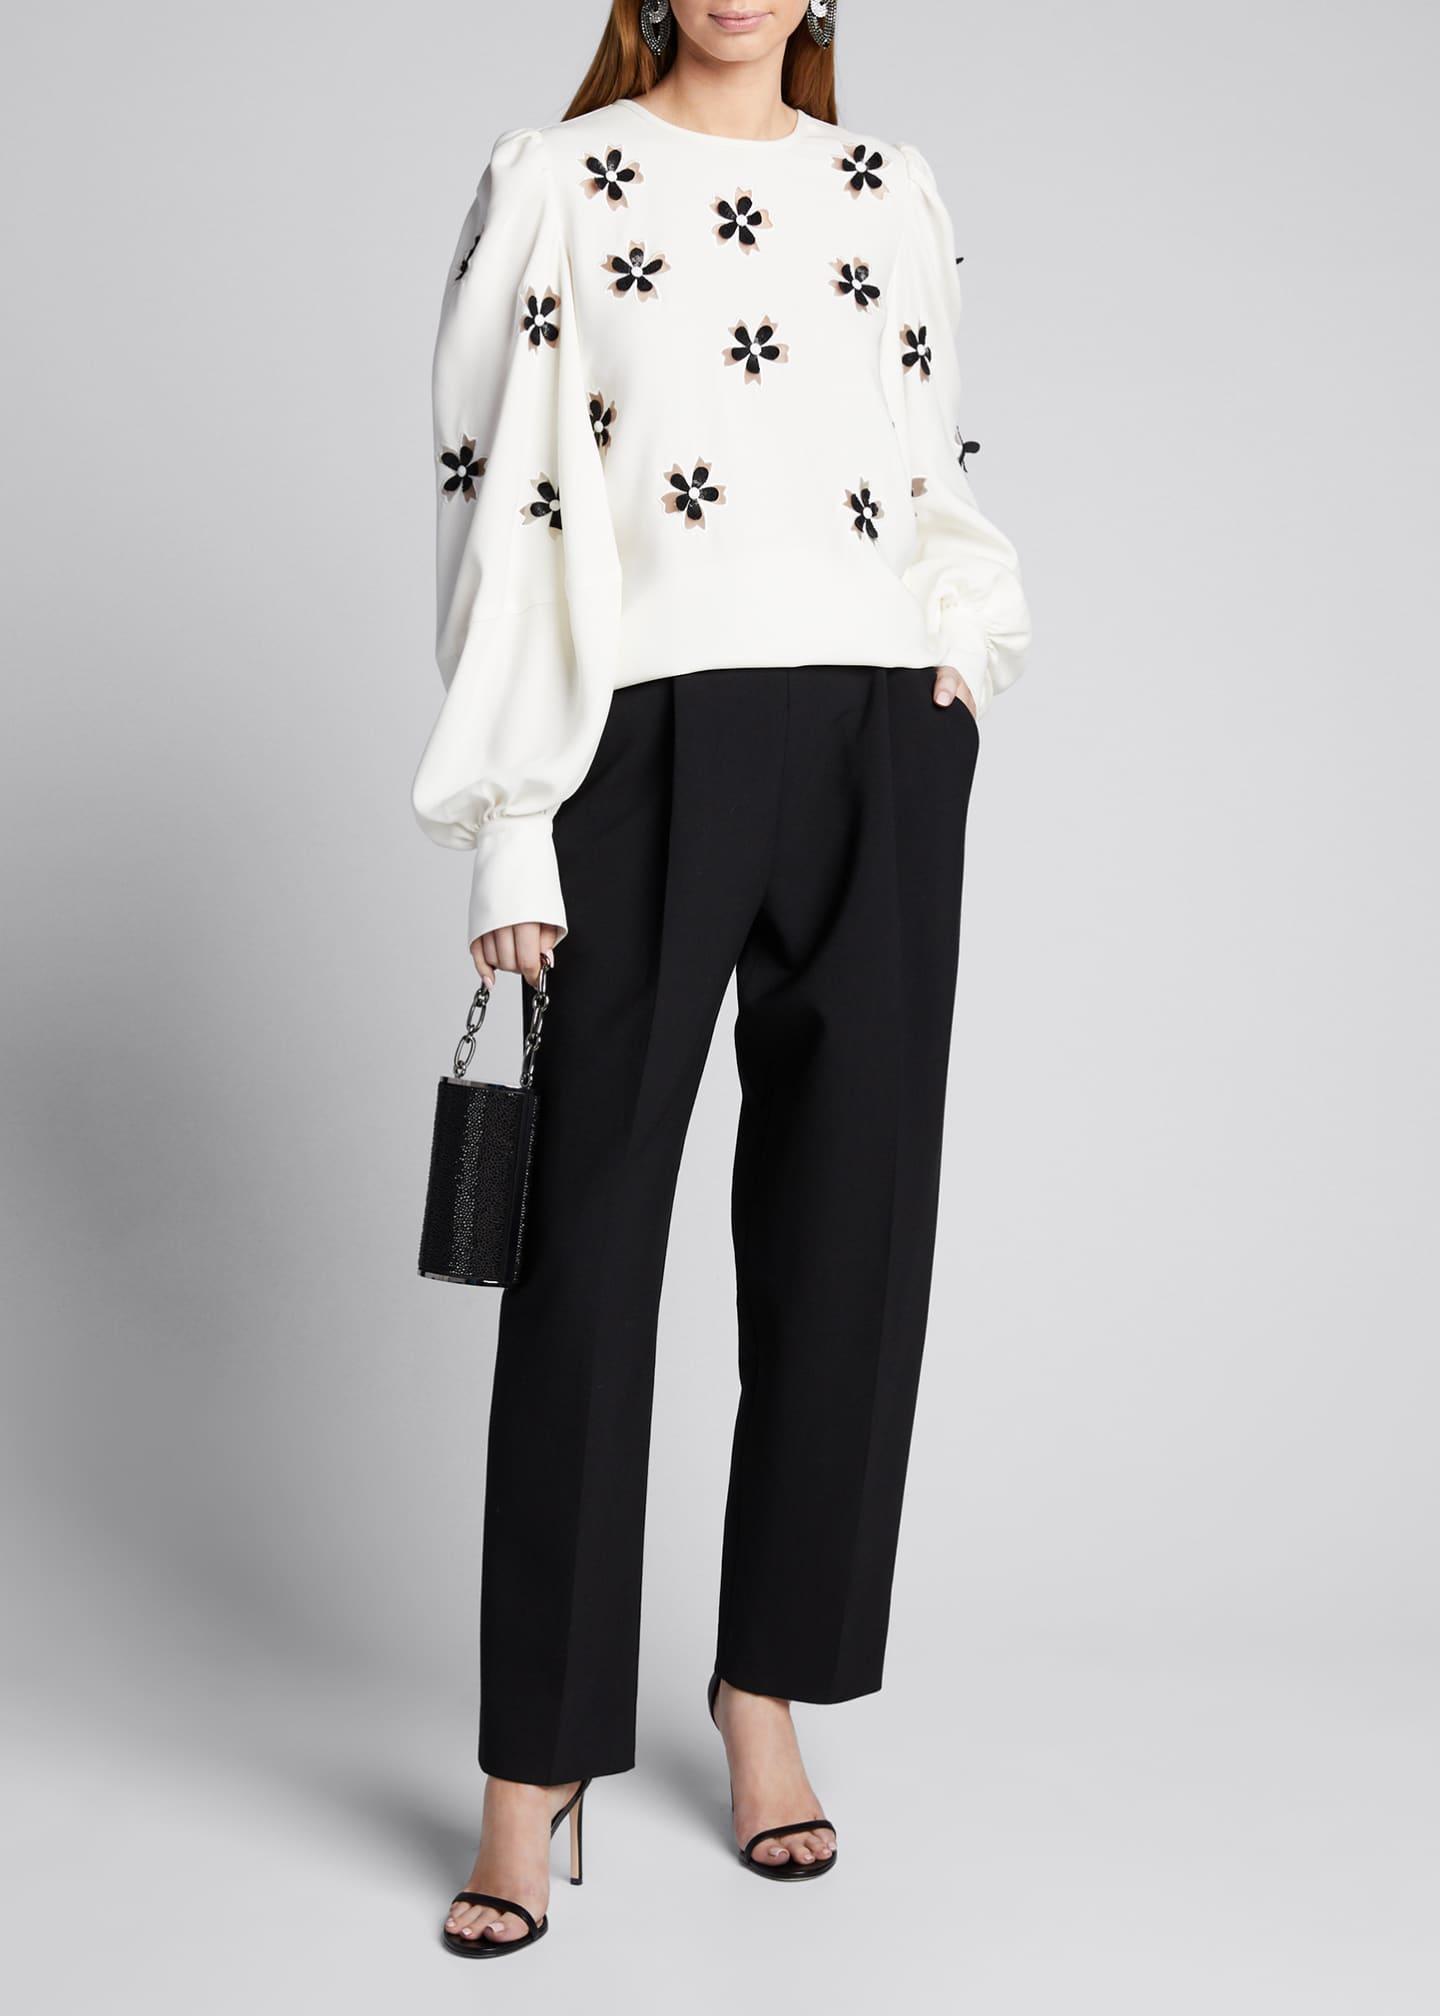 Oscar de la Renta Daisy-Embroidered Silk Puff-Sleeve Blouse